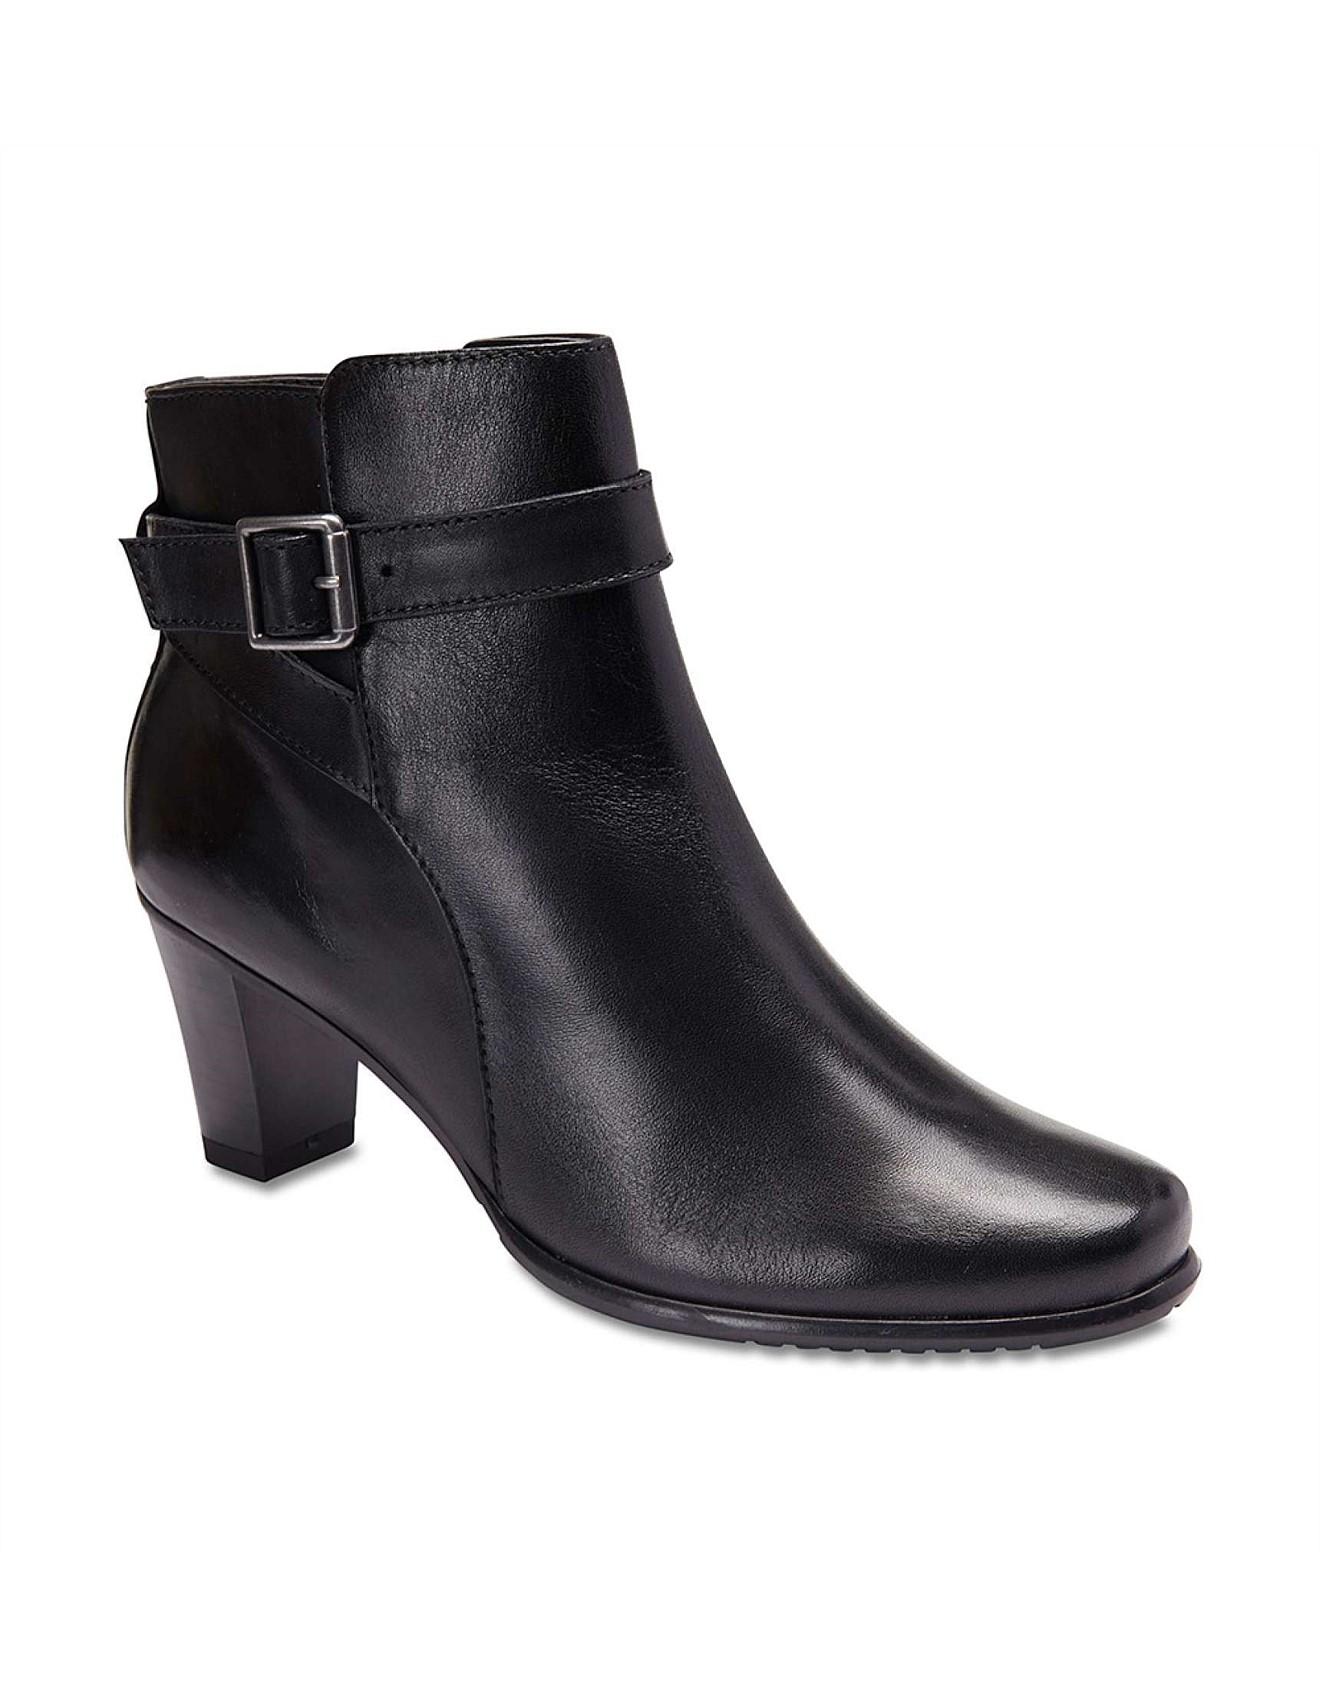 258e4e0ac62 Buckle Trim Ankle Boot